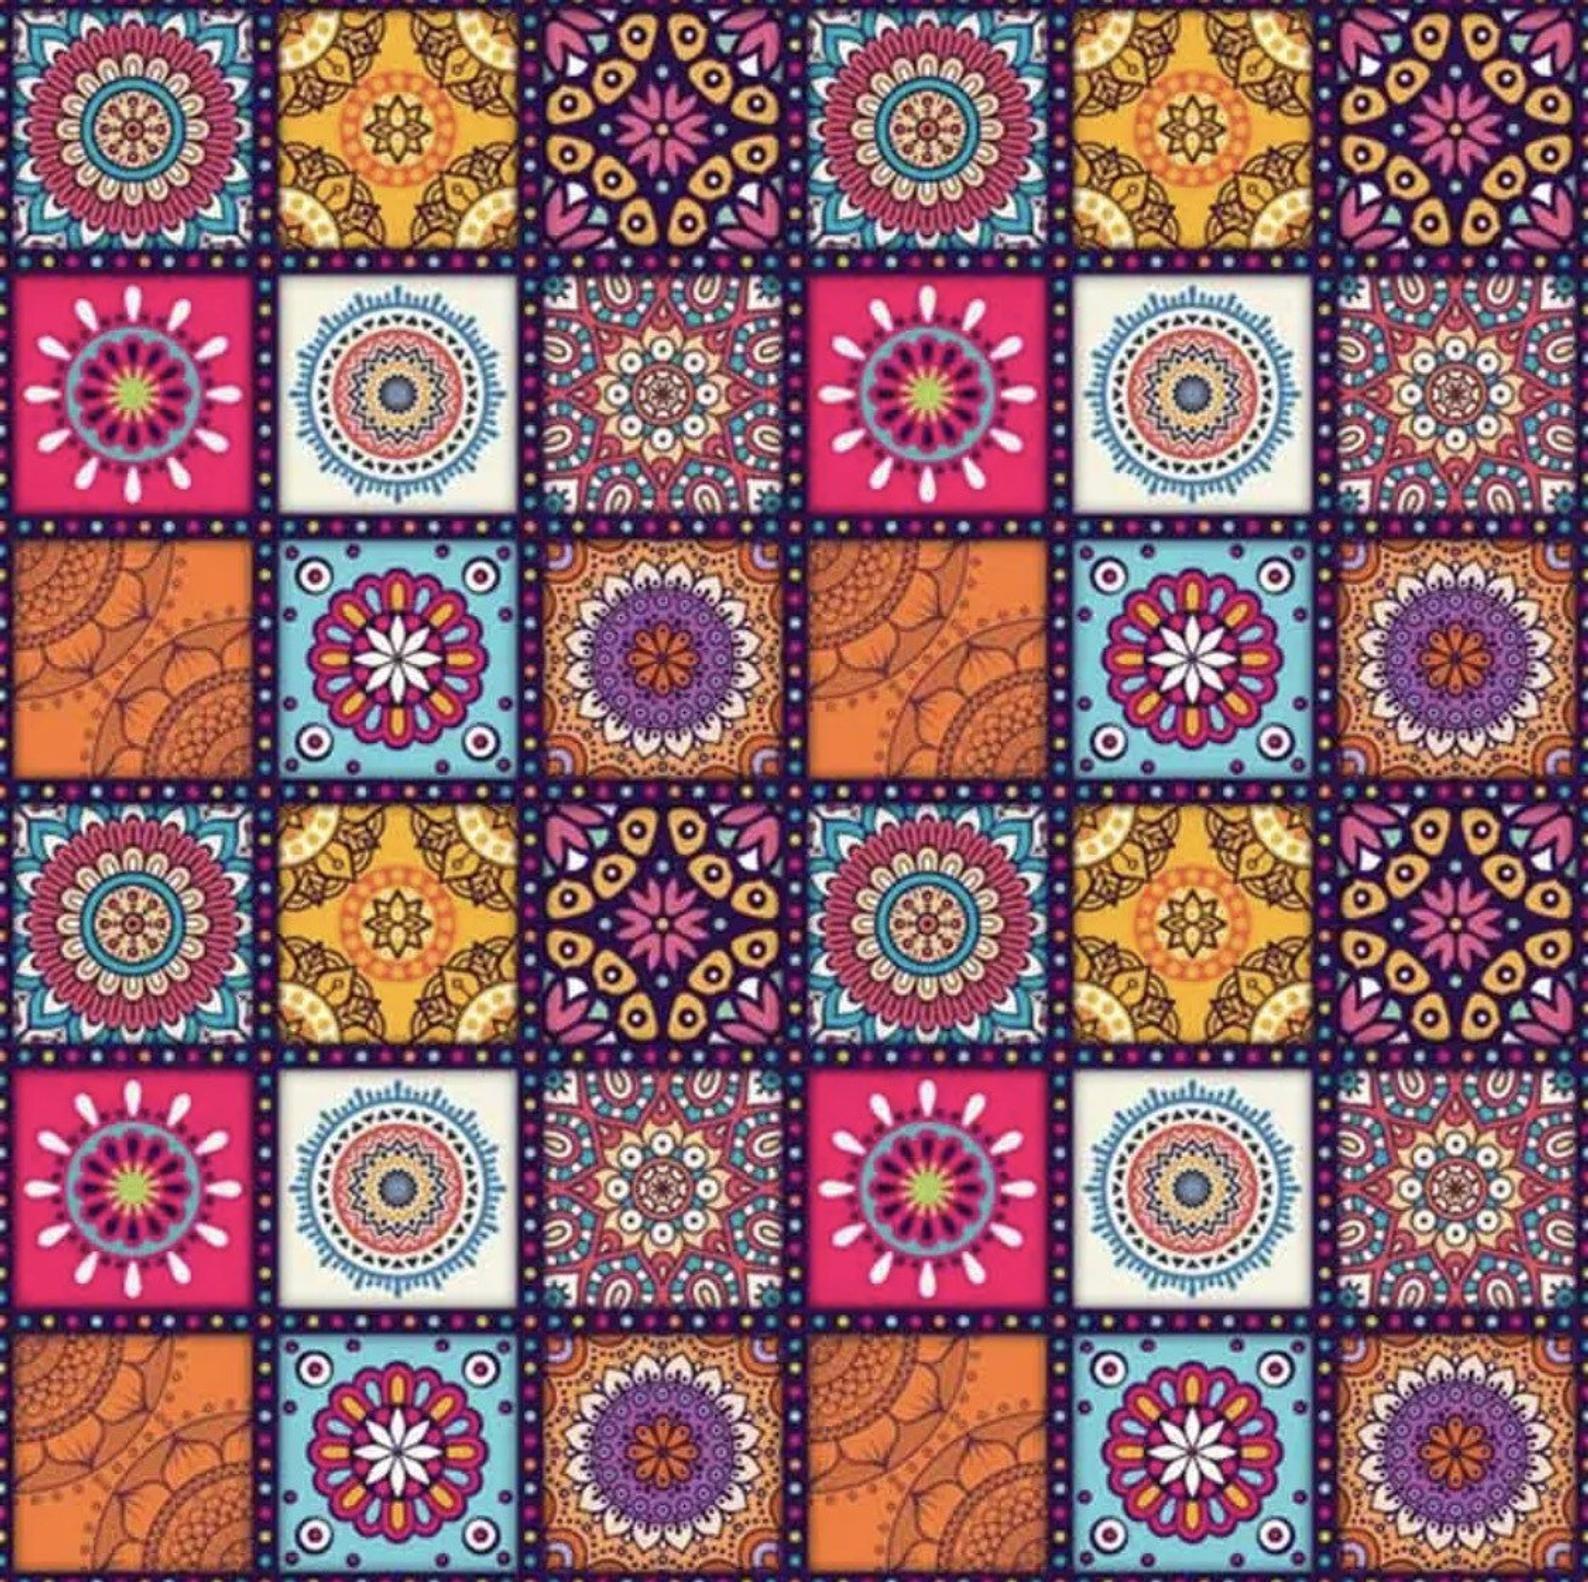 Us Seller 40x40cm Mandalas Quilt Inspired Pattern Diamond Etsy Mandala Pattern Diamond Painting Mandala Art